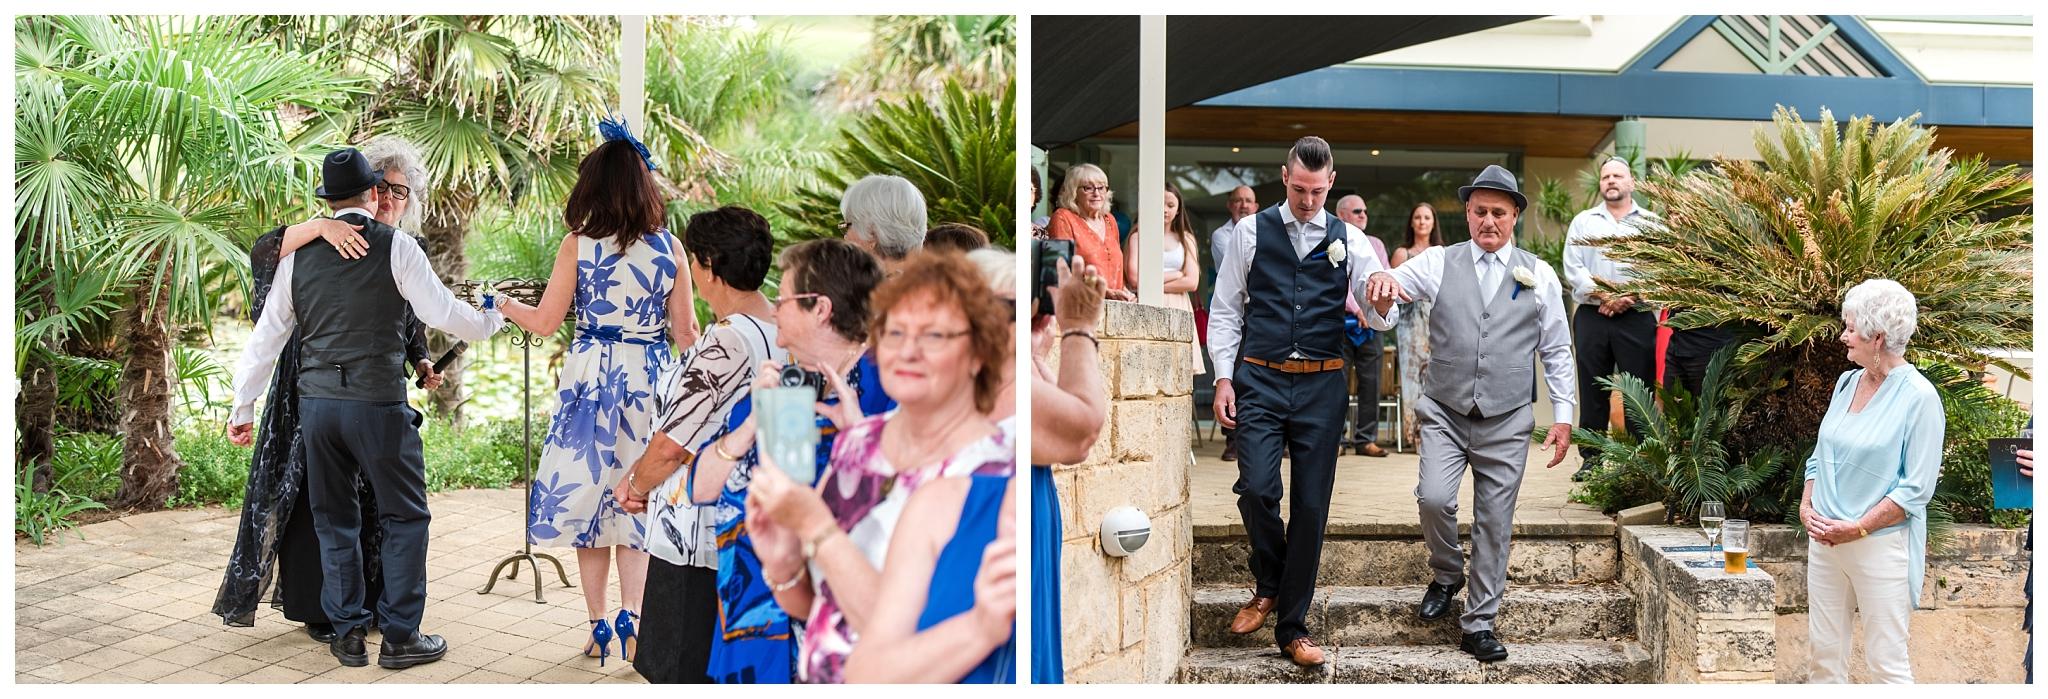 Meadow Springs Golf Course Wedding